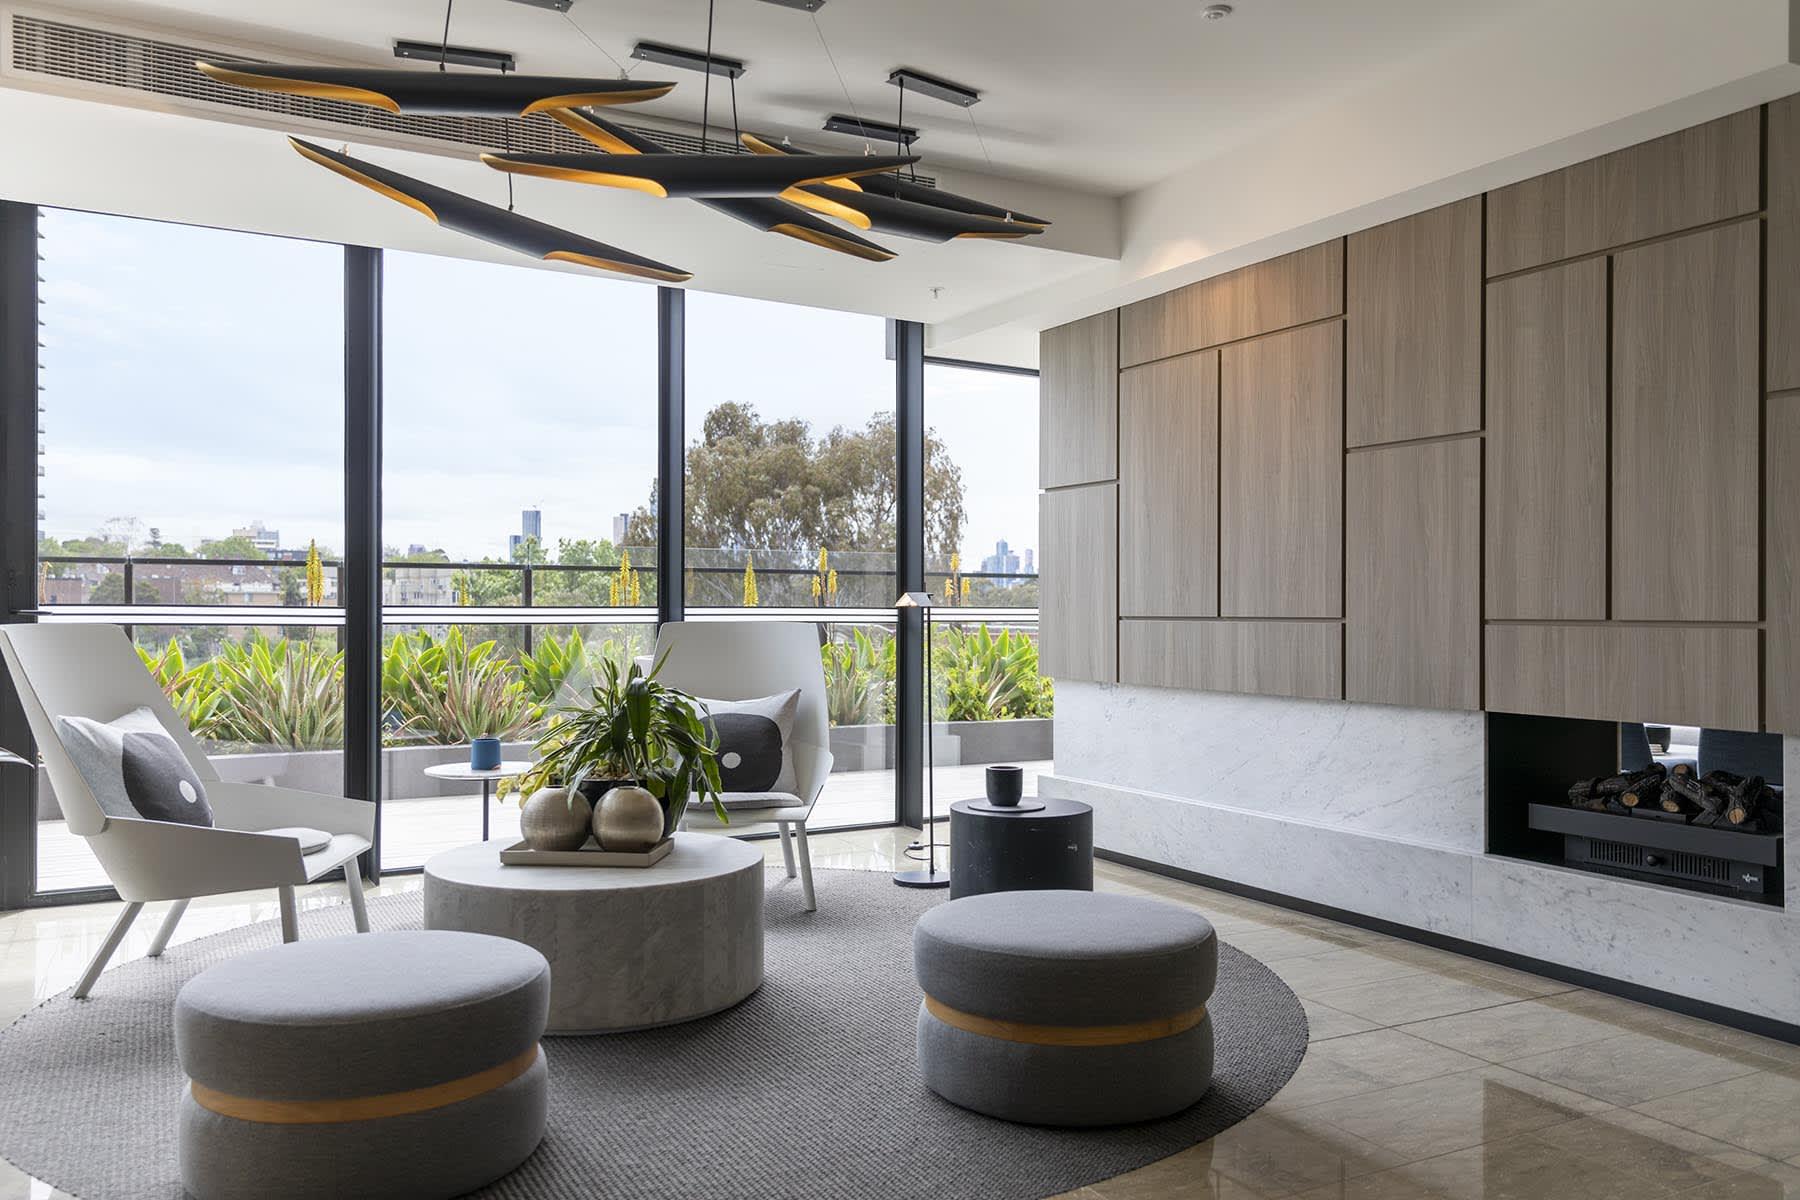 Three luxury three-bedroom residences on the market in Melbourne's Stonnington